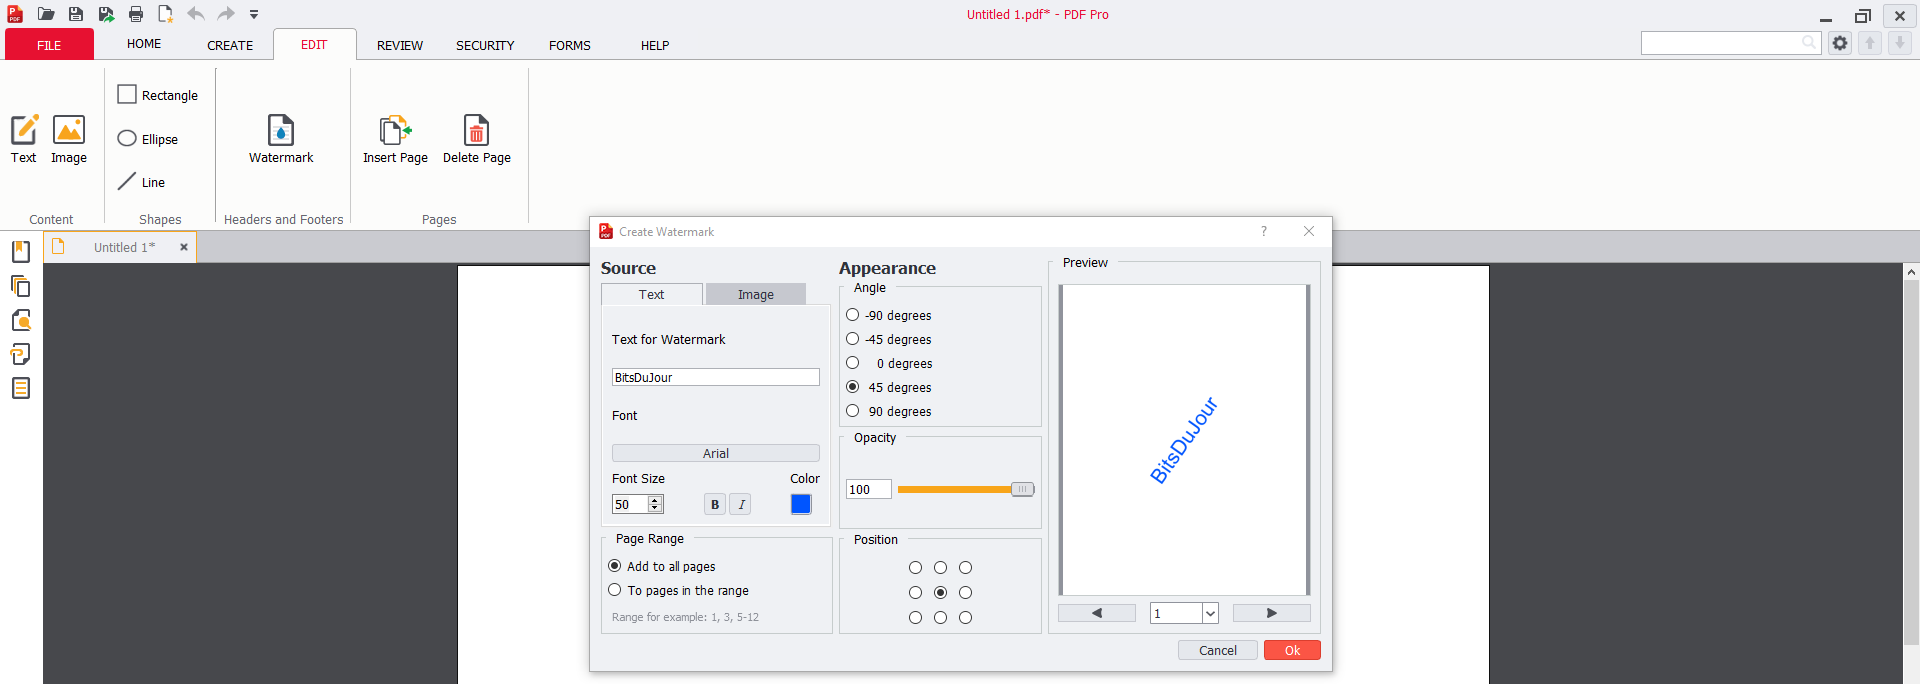 PDF Pro Screenshot 9